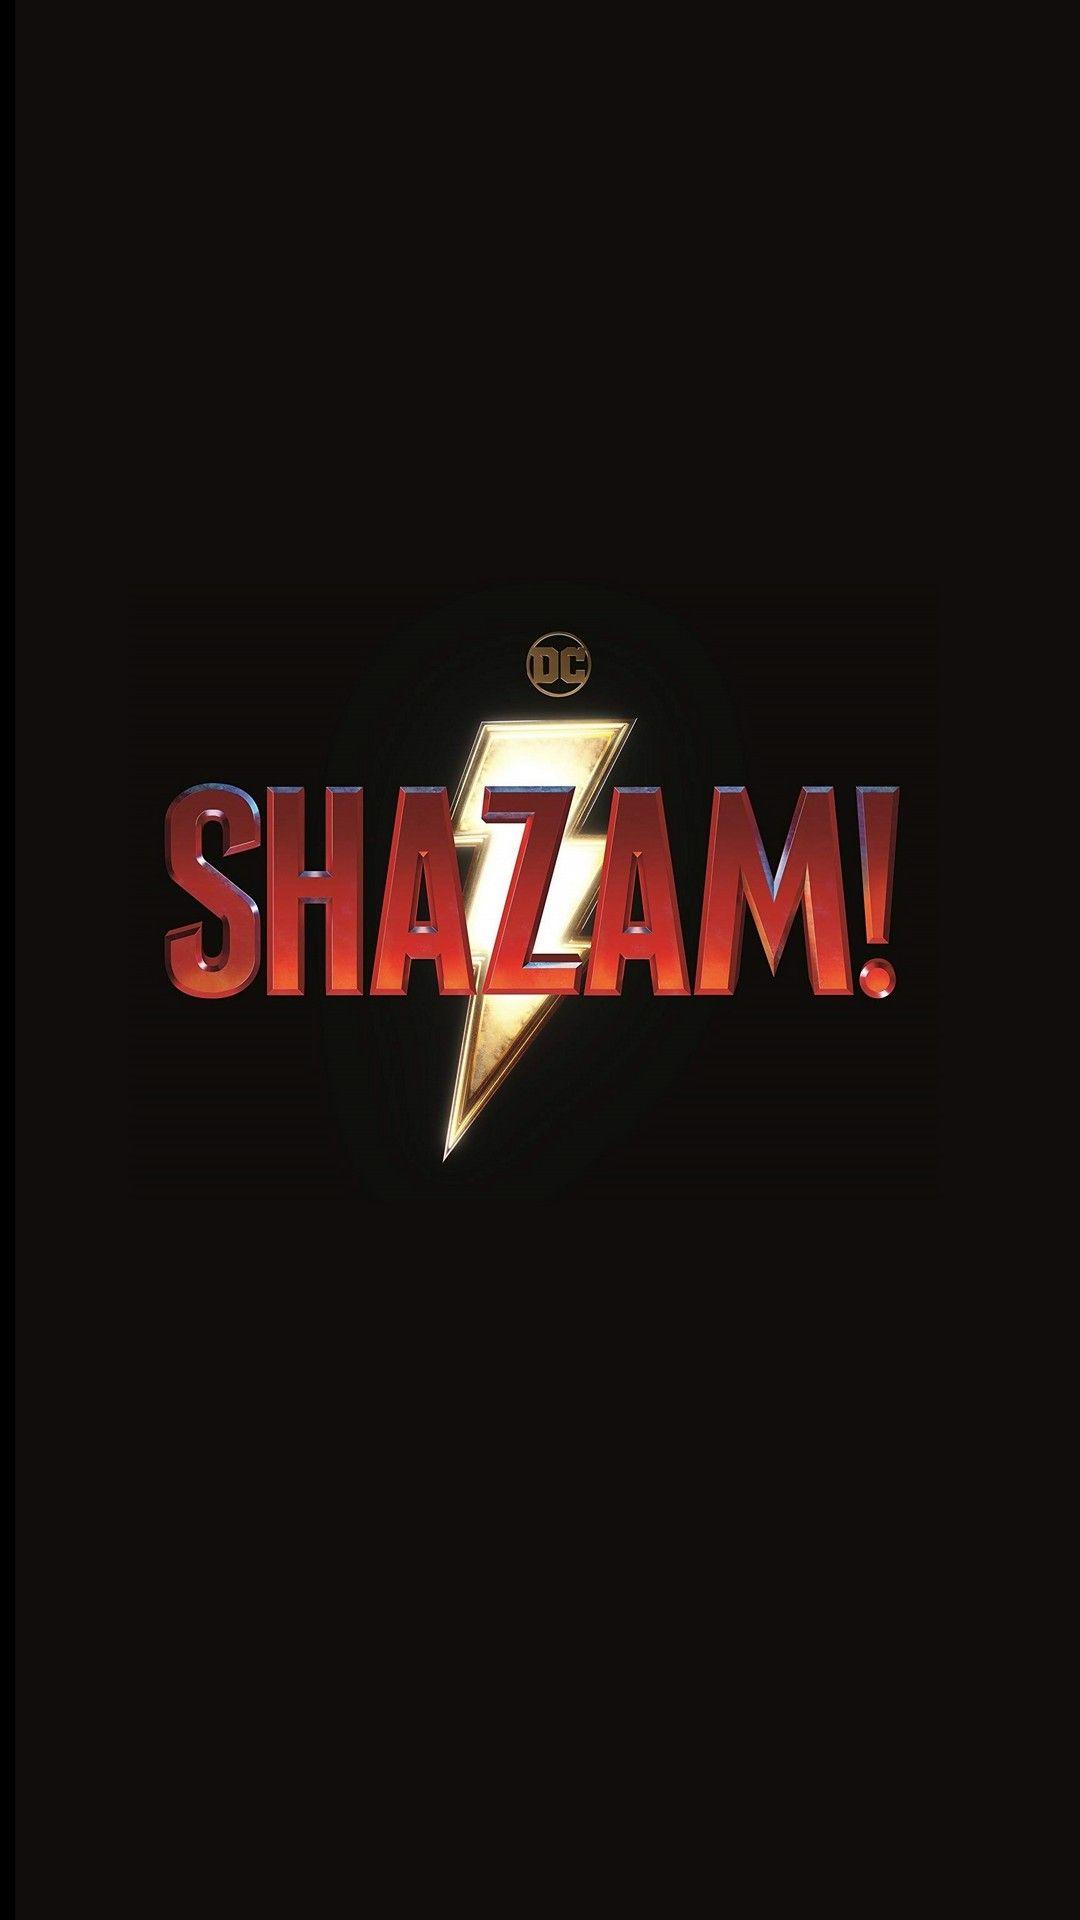 Shazam! 2019 Poster Movie - Best Movie Poster Wallpaper HD